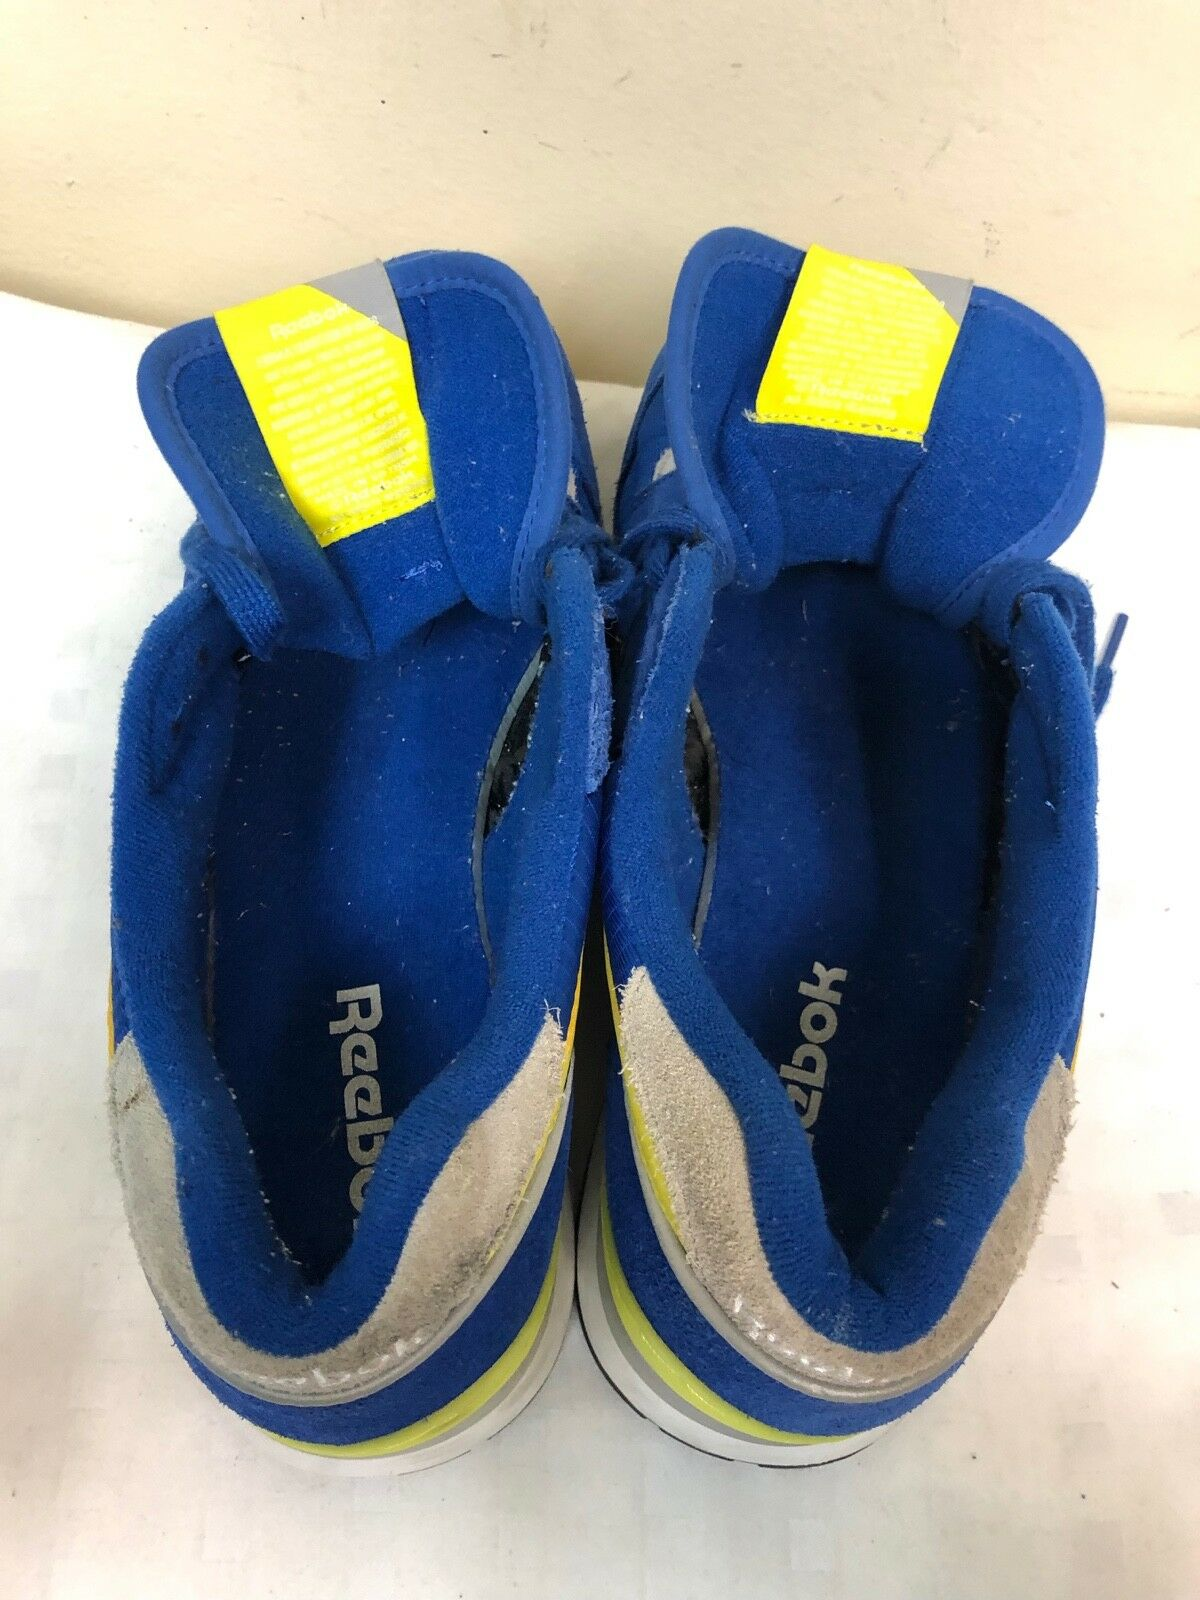 Reebok GL 6000 Men Blau Gelb Athletic Athletic Athletic Turnschuhe -SAMPLE- Größe 12 EUR 45.5 181aa4